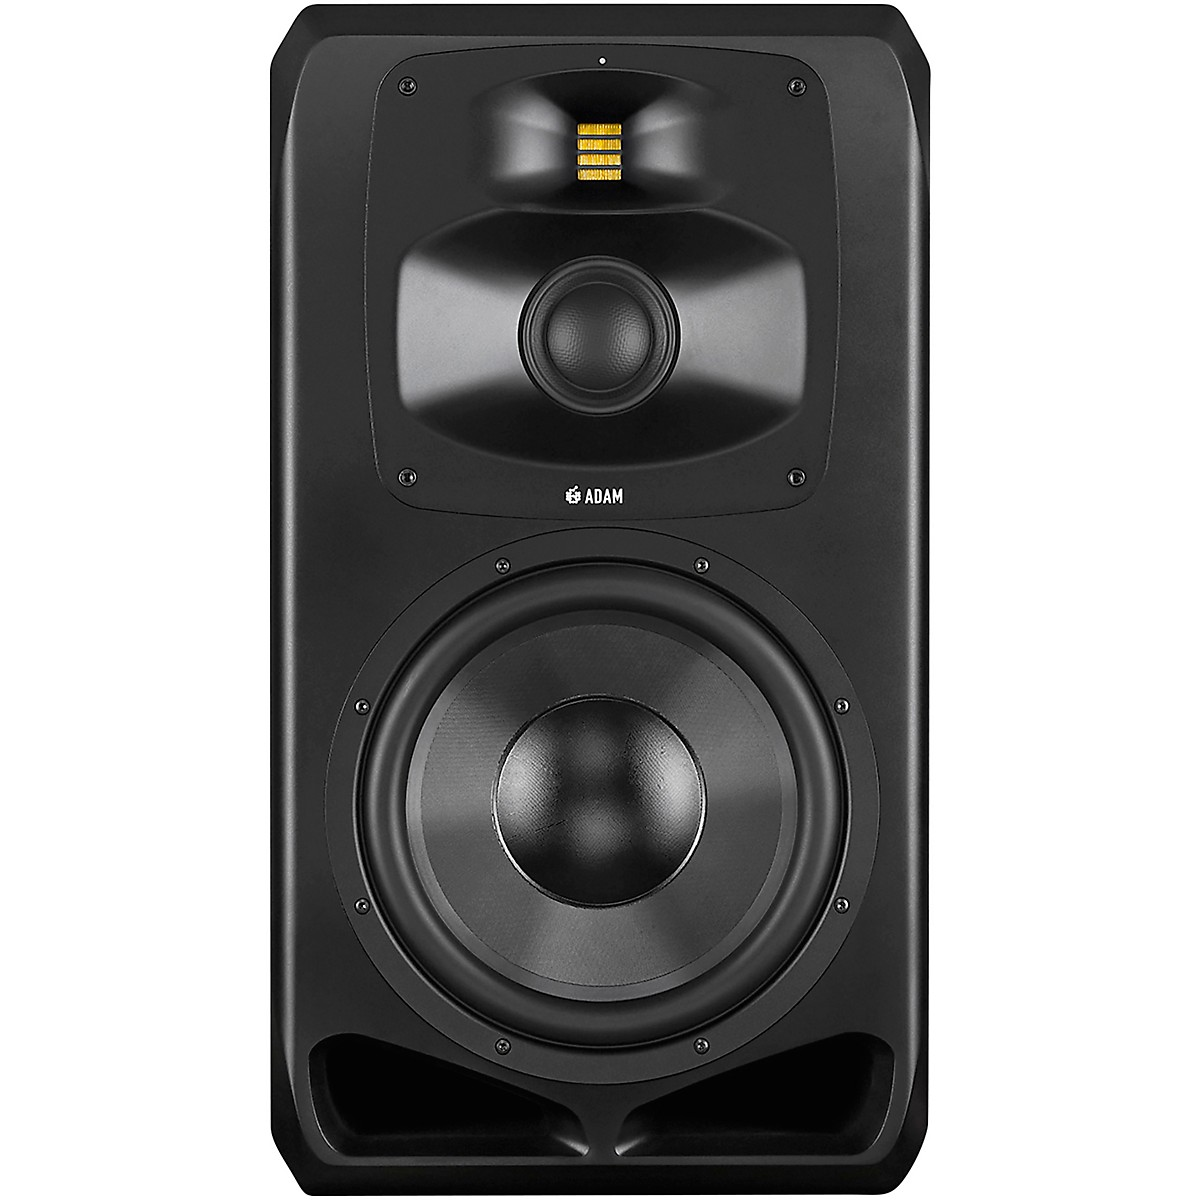 Adam Audio S5V Premium Vertical mid-field Monitor, 3-way 12